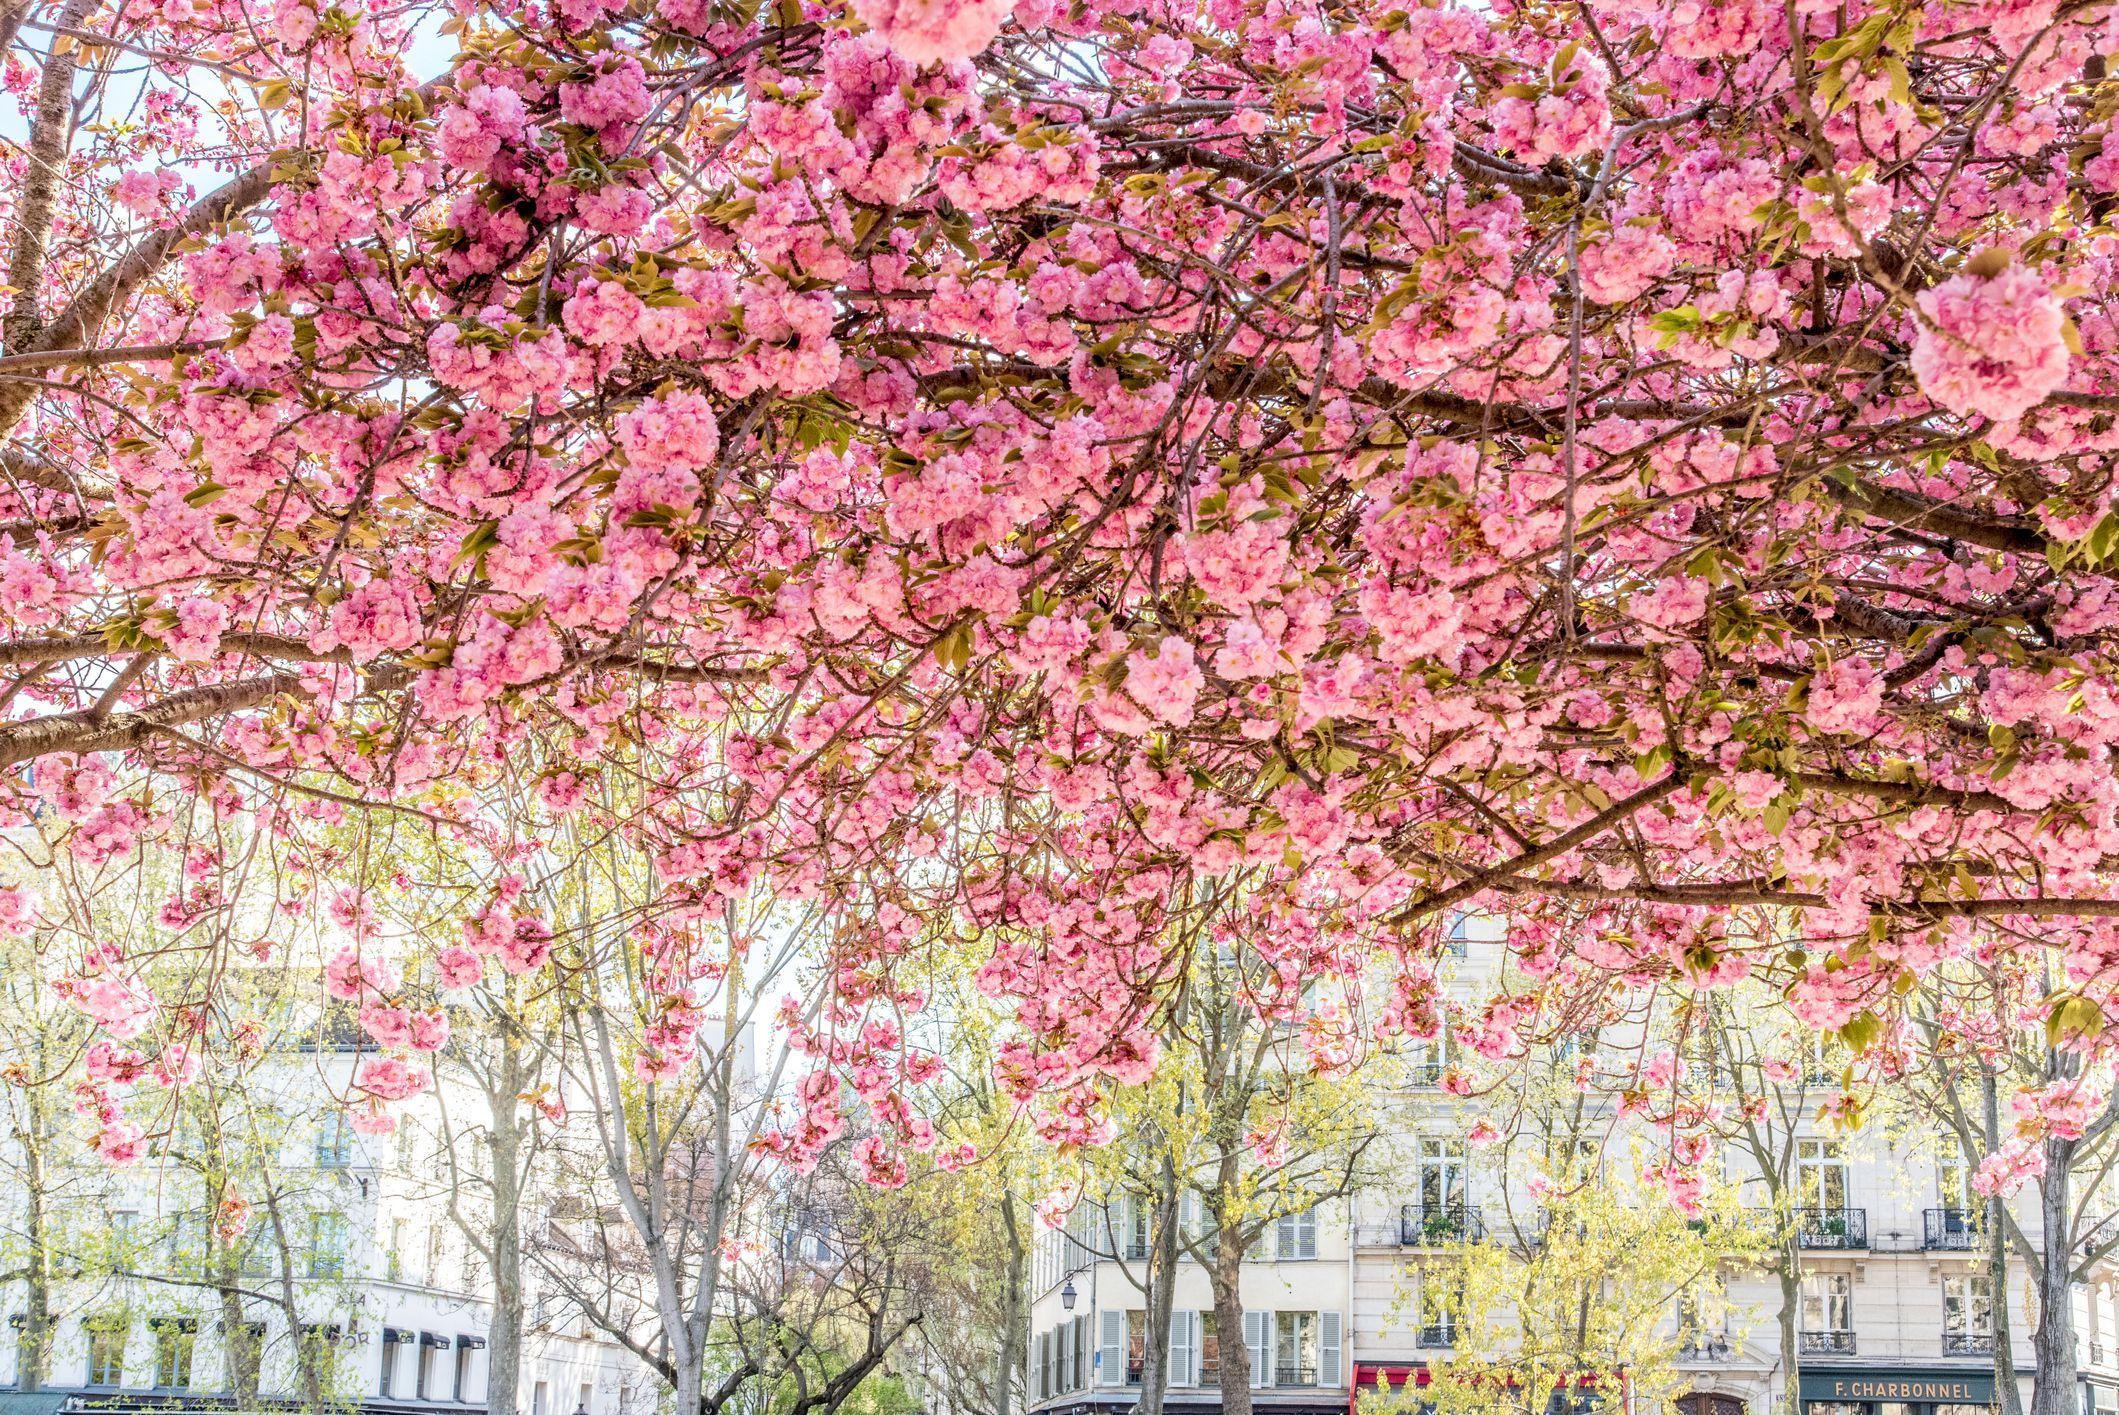 Cherry Blossoms A Washington Dc Tradition I Rightplantz Com How To Grow Cherries Blossom Cherry Blossom Tree